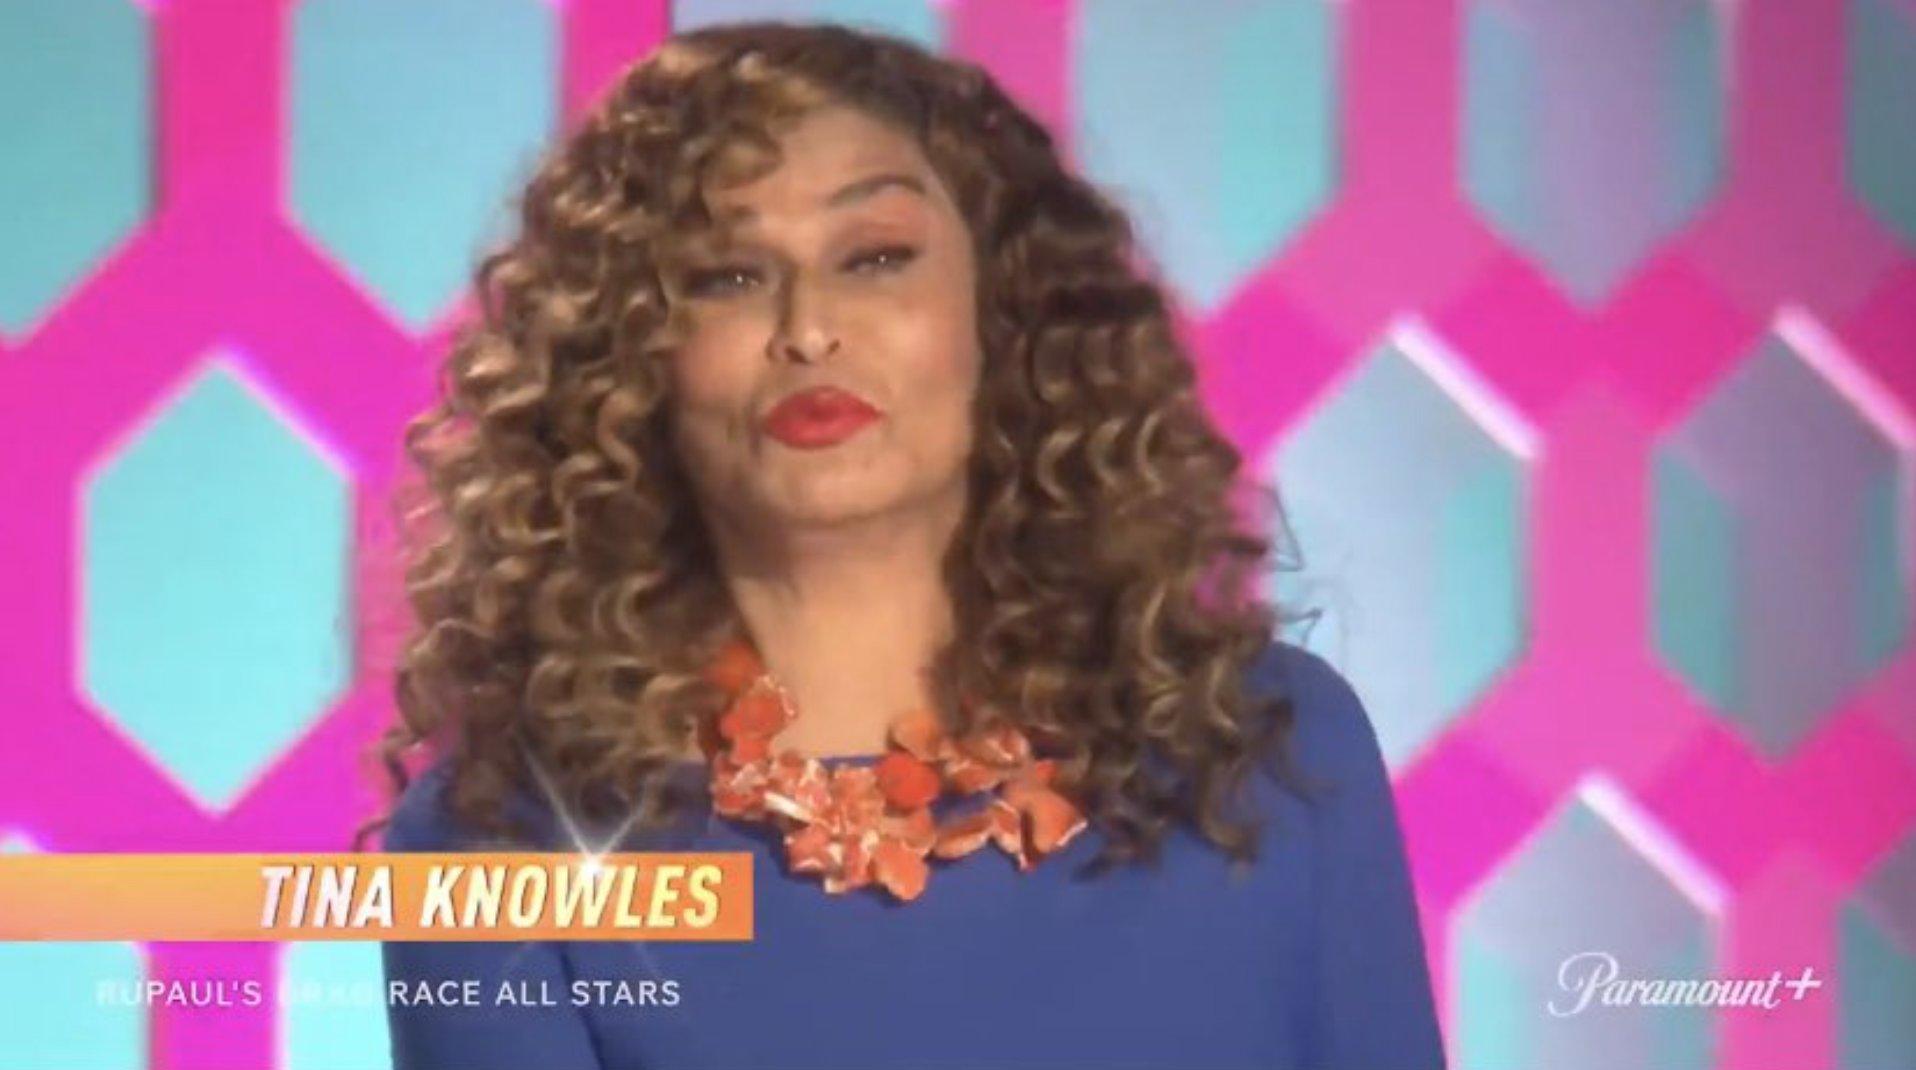 All Stars 6, Tina Knowles